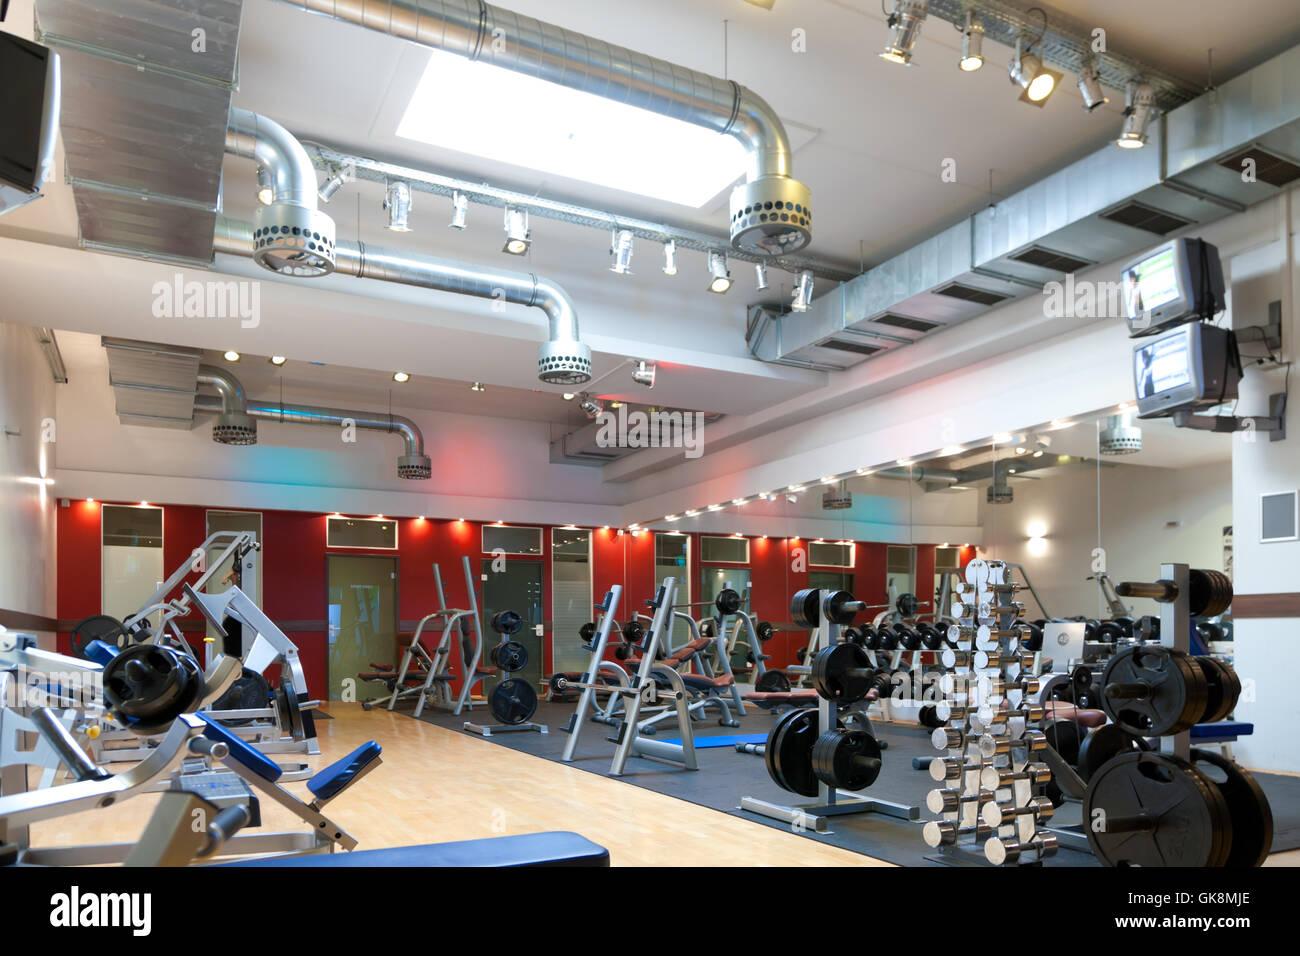 Fitness Centre Stockfotos Amp Fitness Centre Bilder Alamy